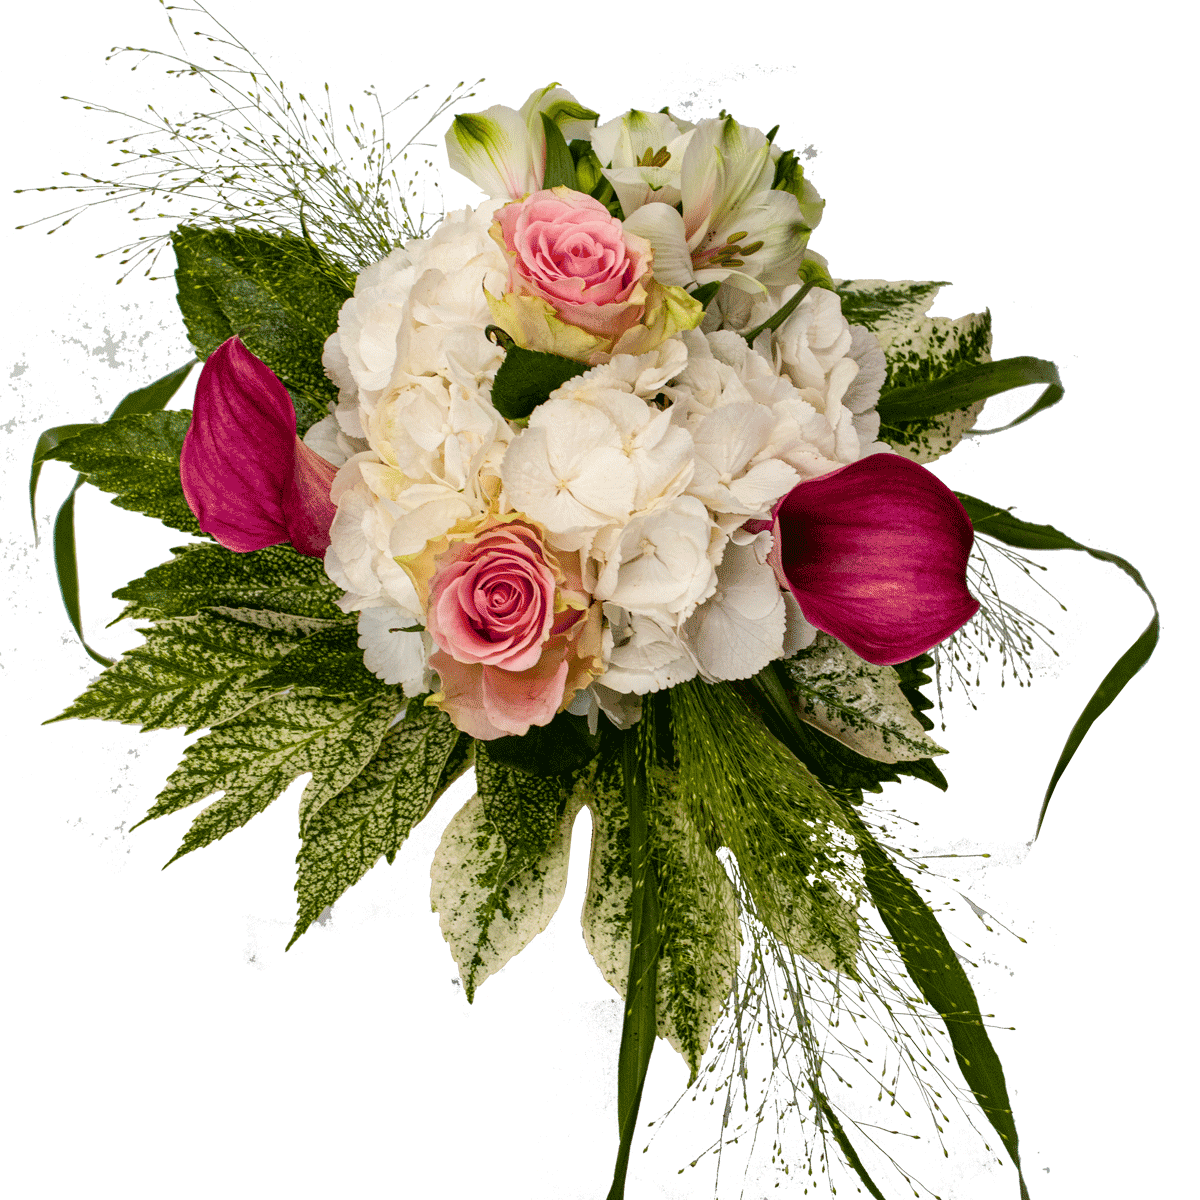 Bouquet ortensia bianca calle colorate rose rosa foglie aralia variegata e panicum